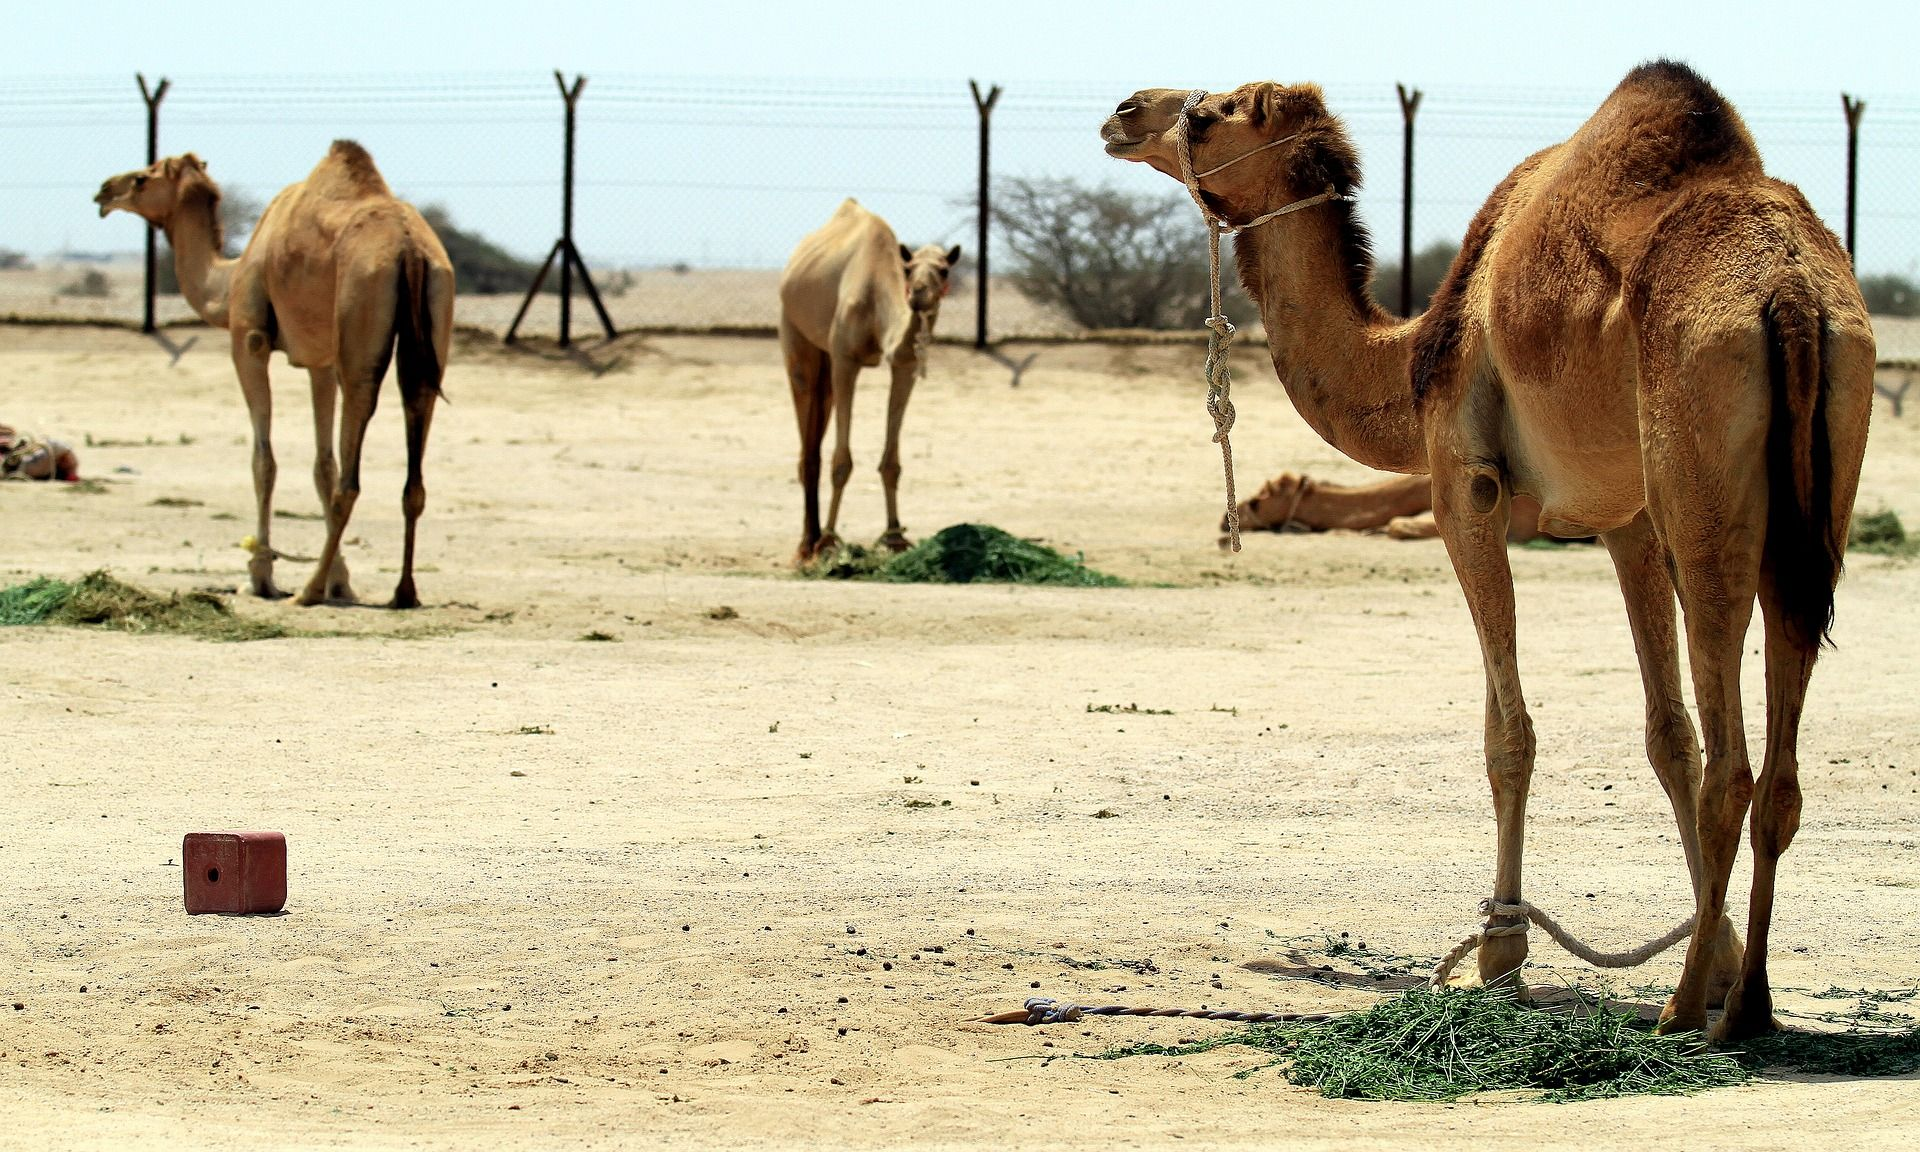 camel-3567271_1920